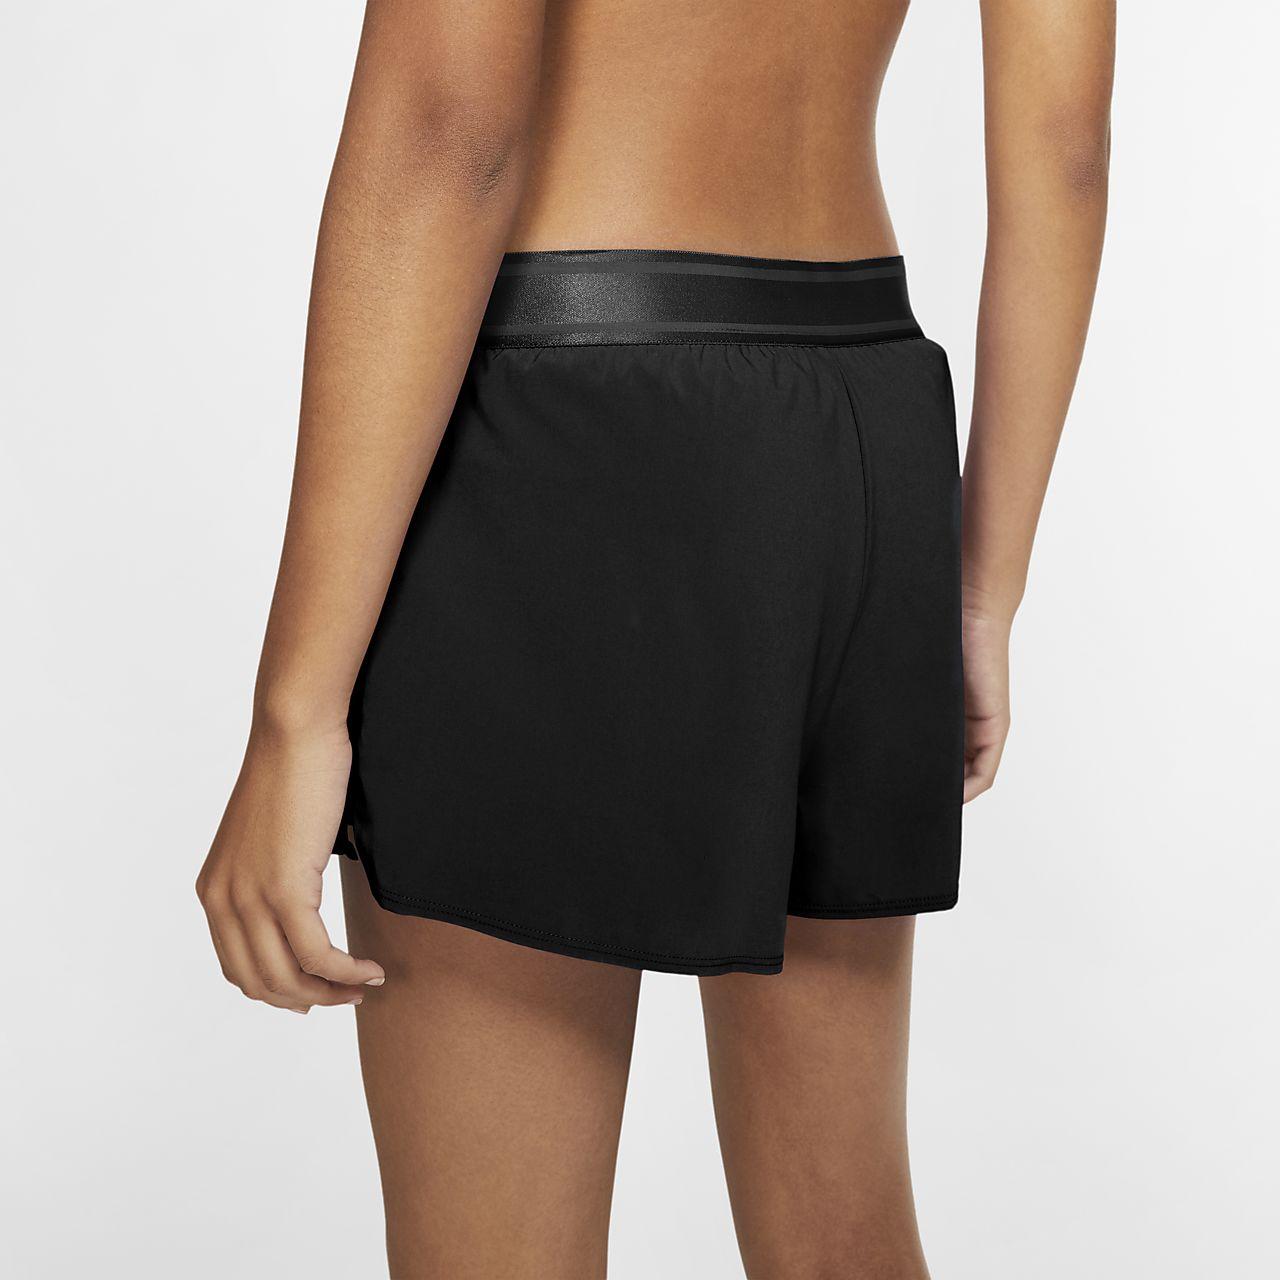 36653313f70 Low Resolution NikeCourt Flex Tennisshorts voor dames NikeCourt Flex  Tennisshorts voor dames